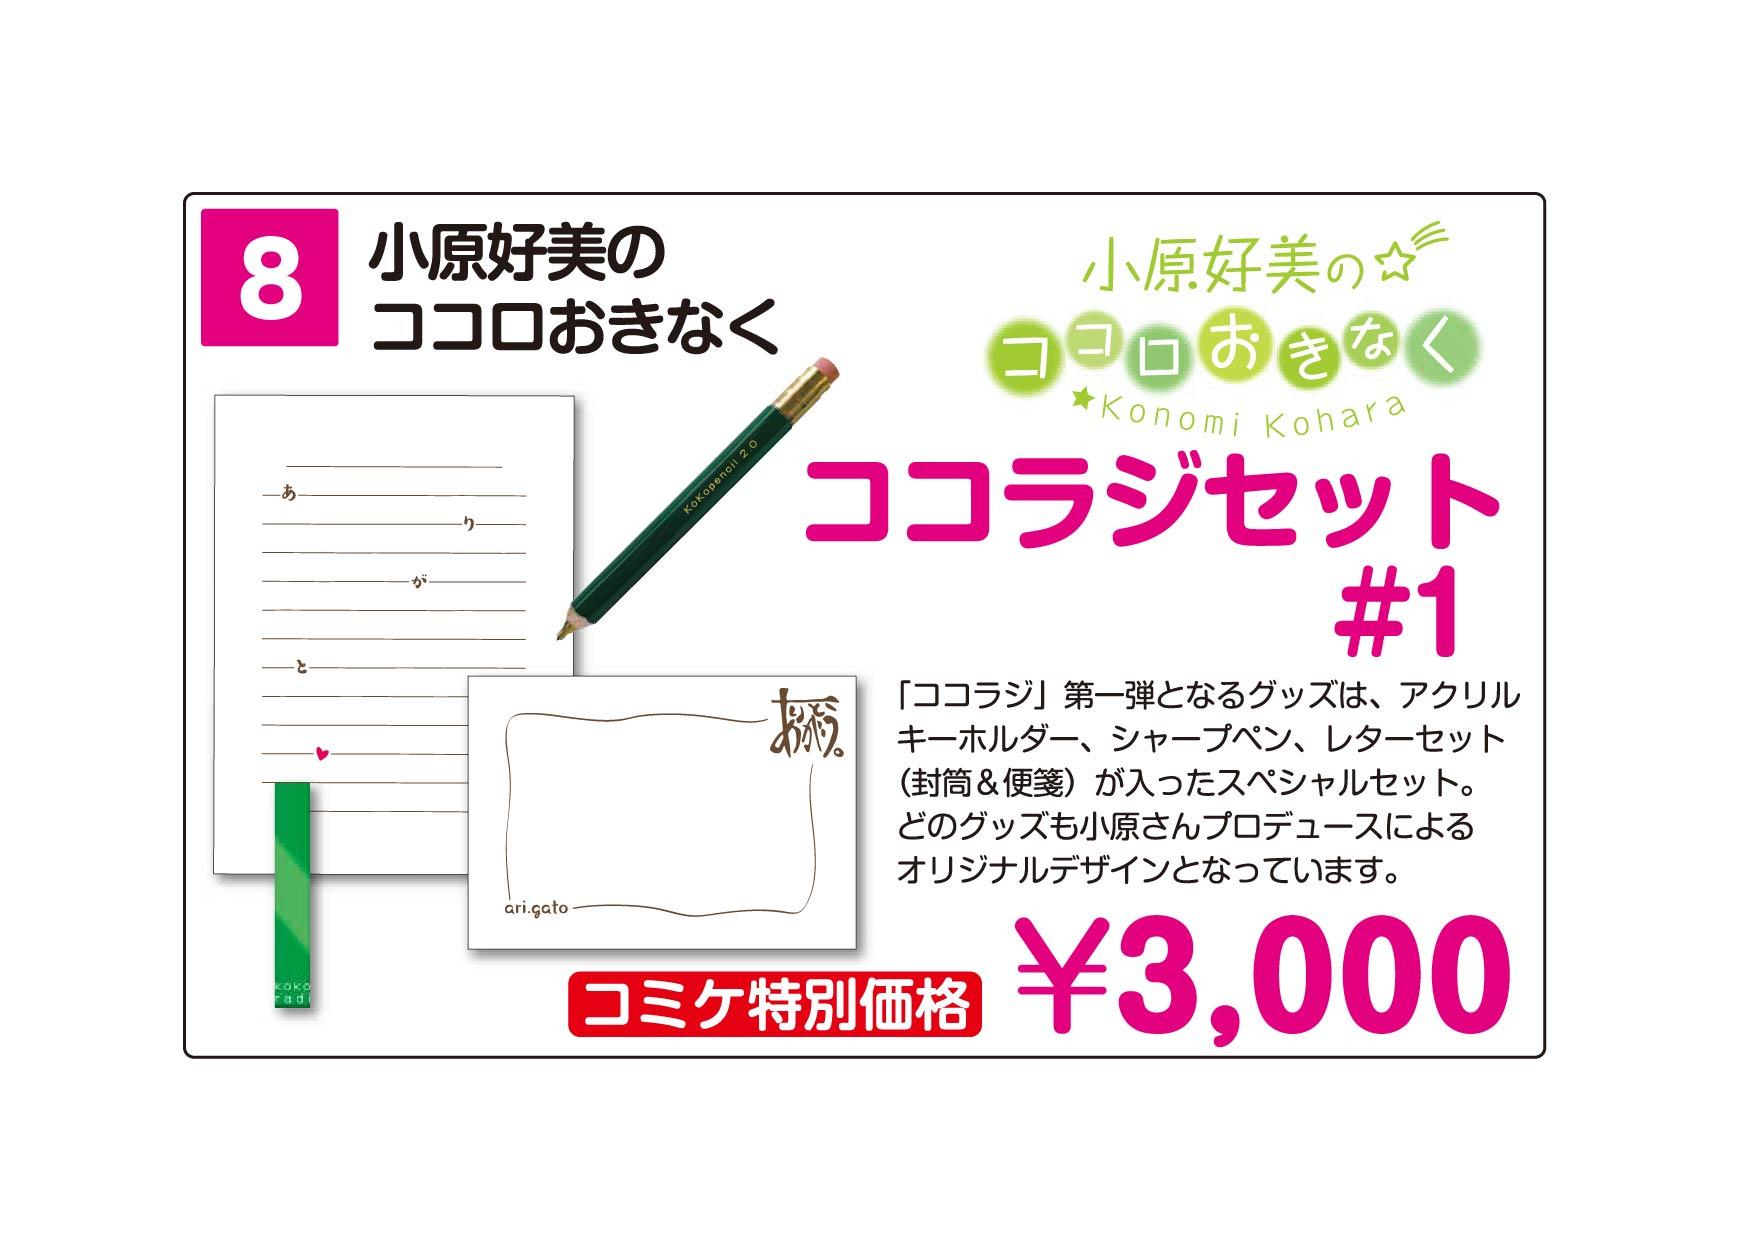 http://www.joqr.co.jp/AandG_booth/08.jpg